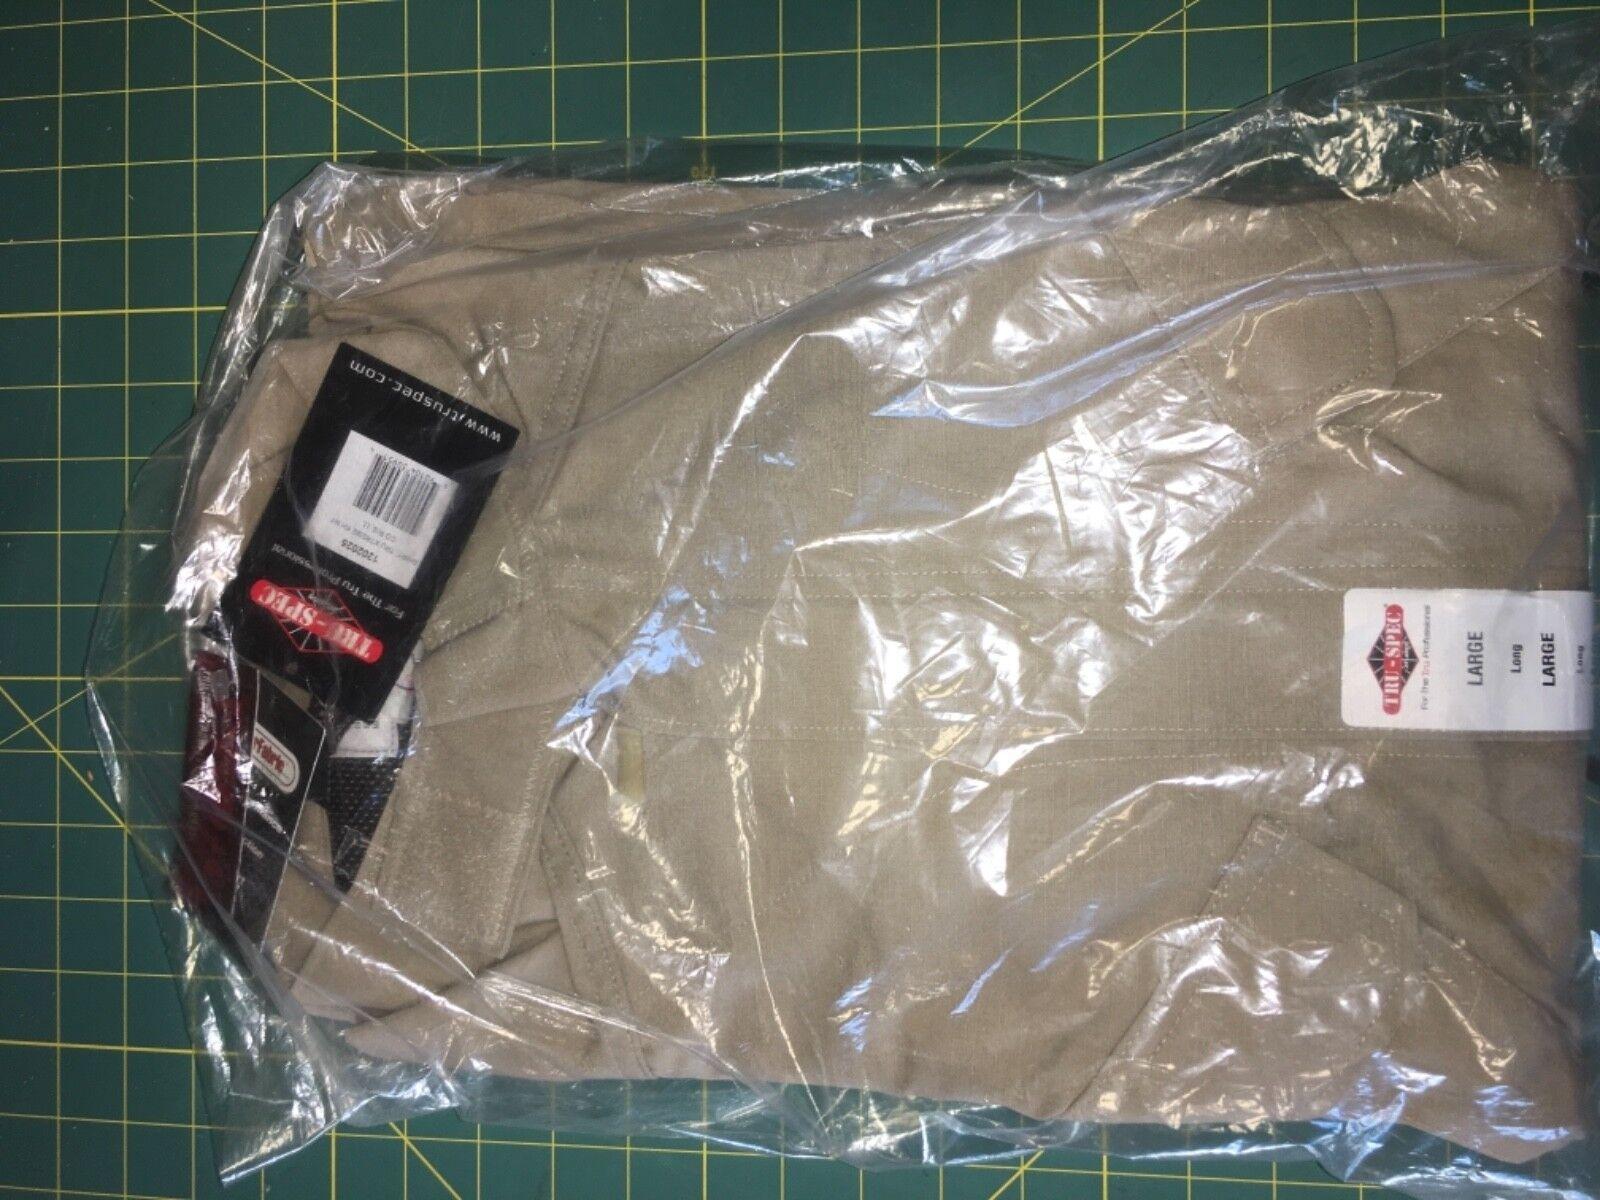 Khaki SHIRT, TRU XTREME NYCO R S, Large  Long  buy 100% authentic quality